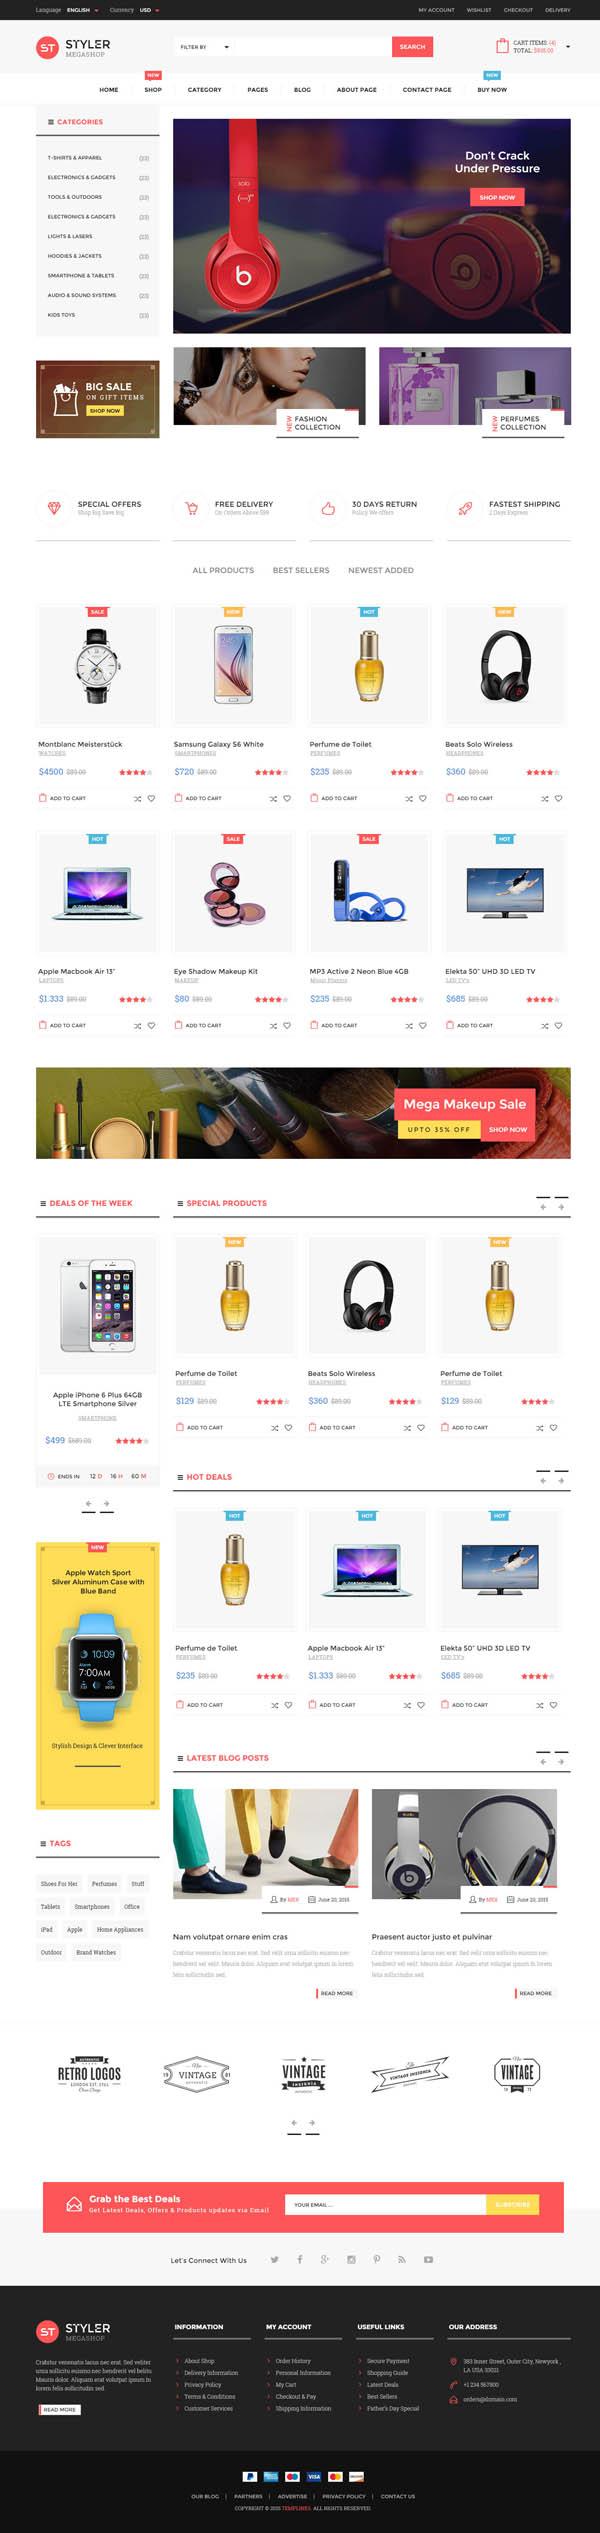 Styler Mega Shop - HTML Template